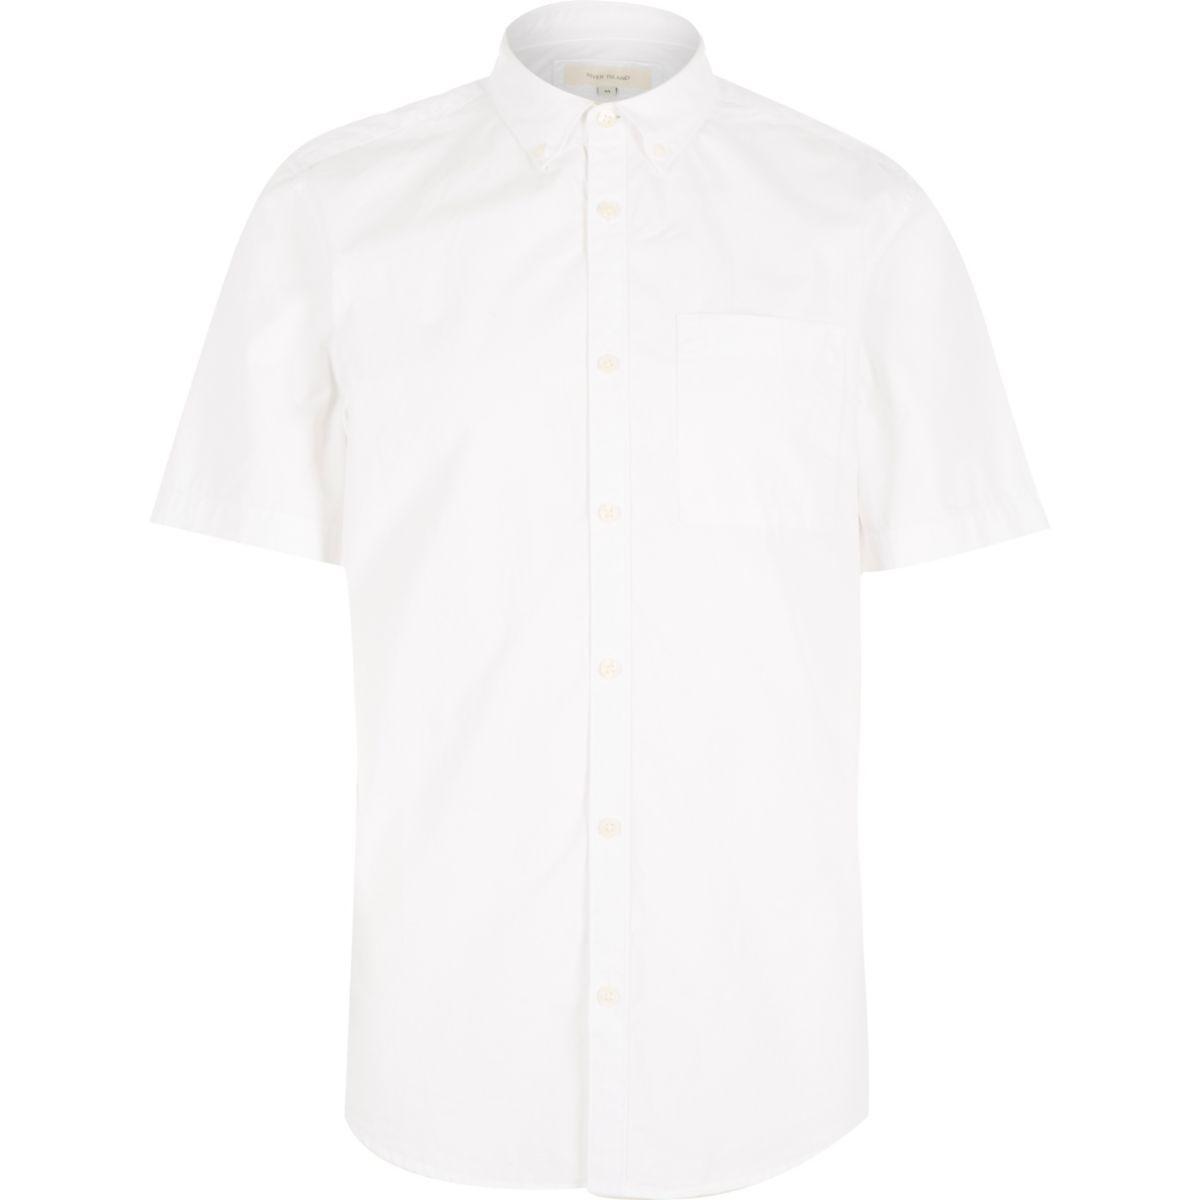 White twill short sleeve shirt